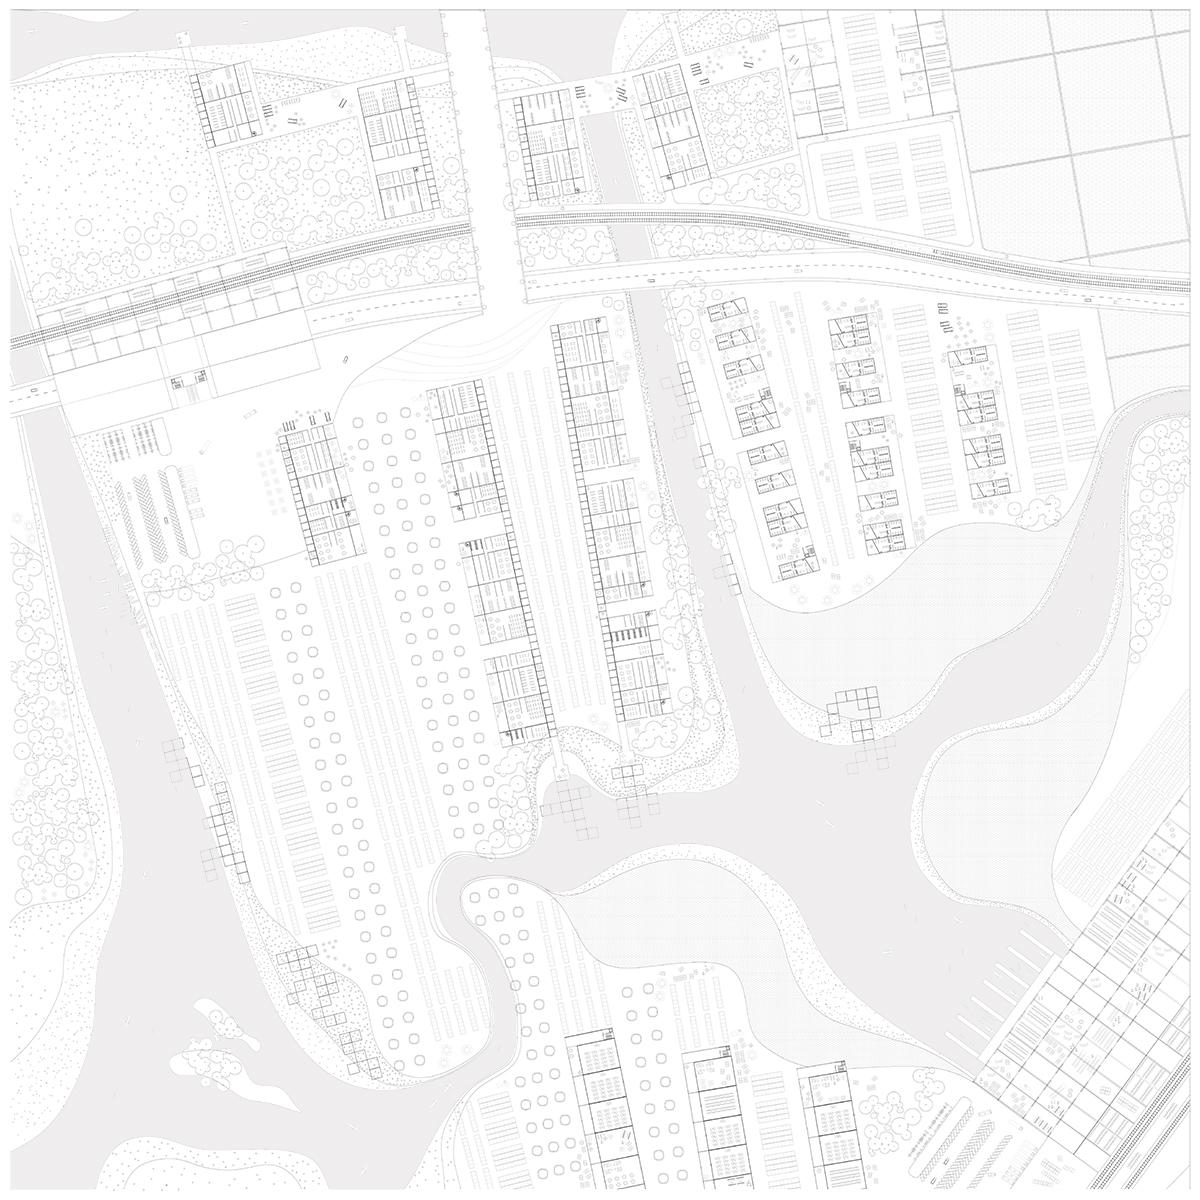 Site Nine: Plan